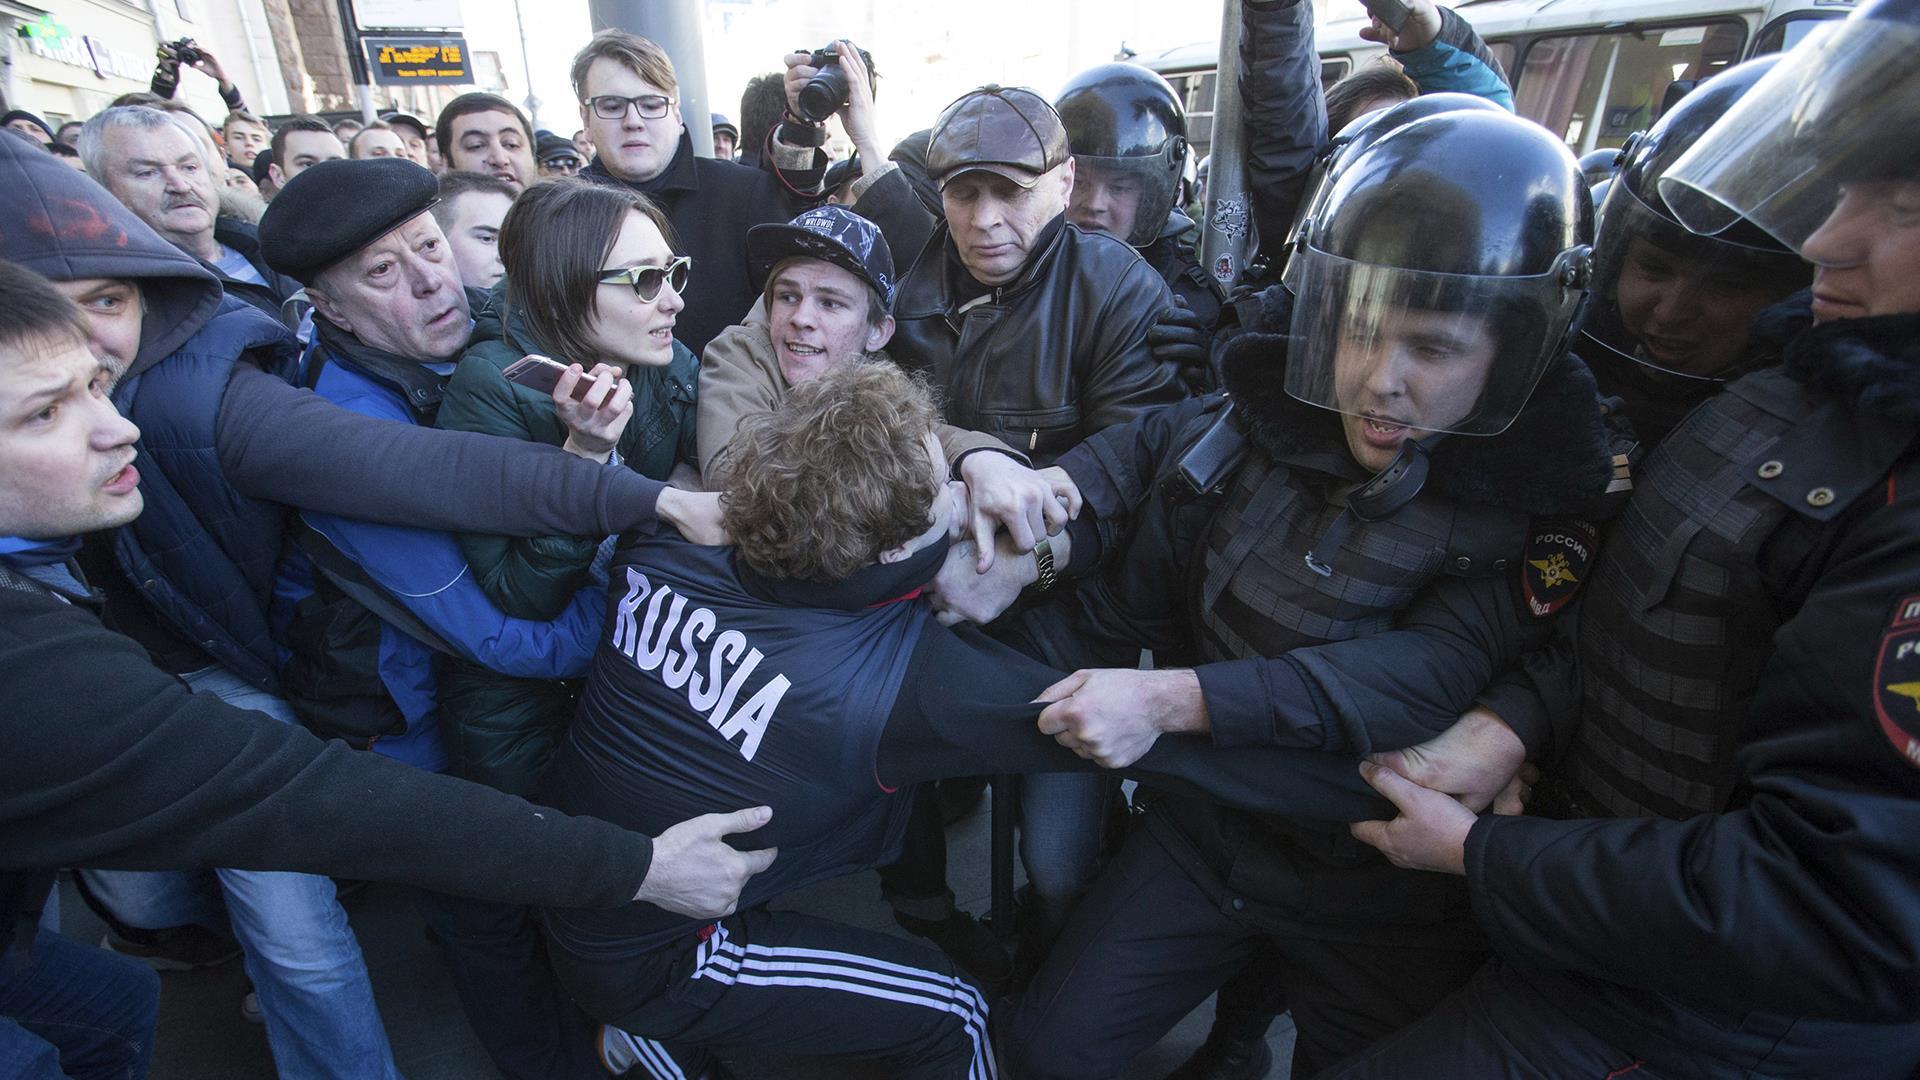 Russian Police Arrest Dozens at Anti-Corruption Protests